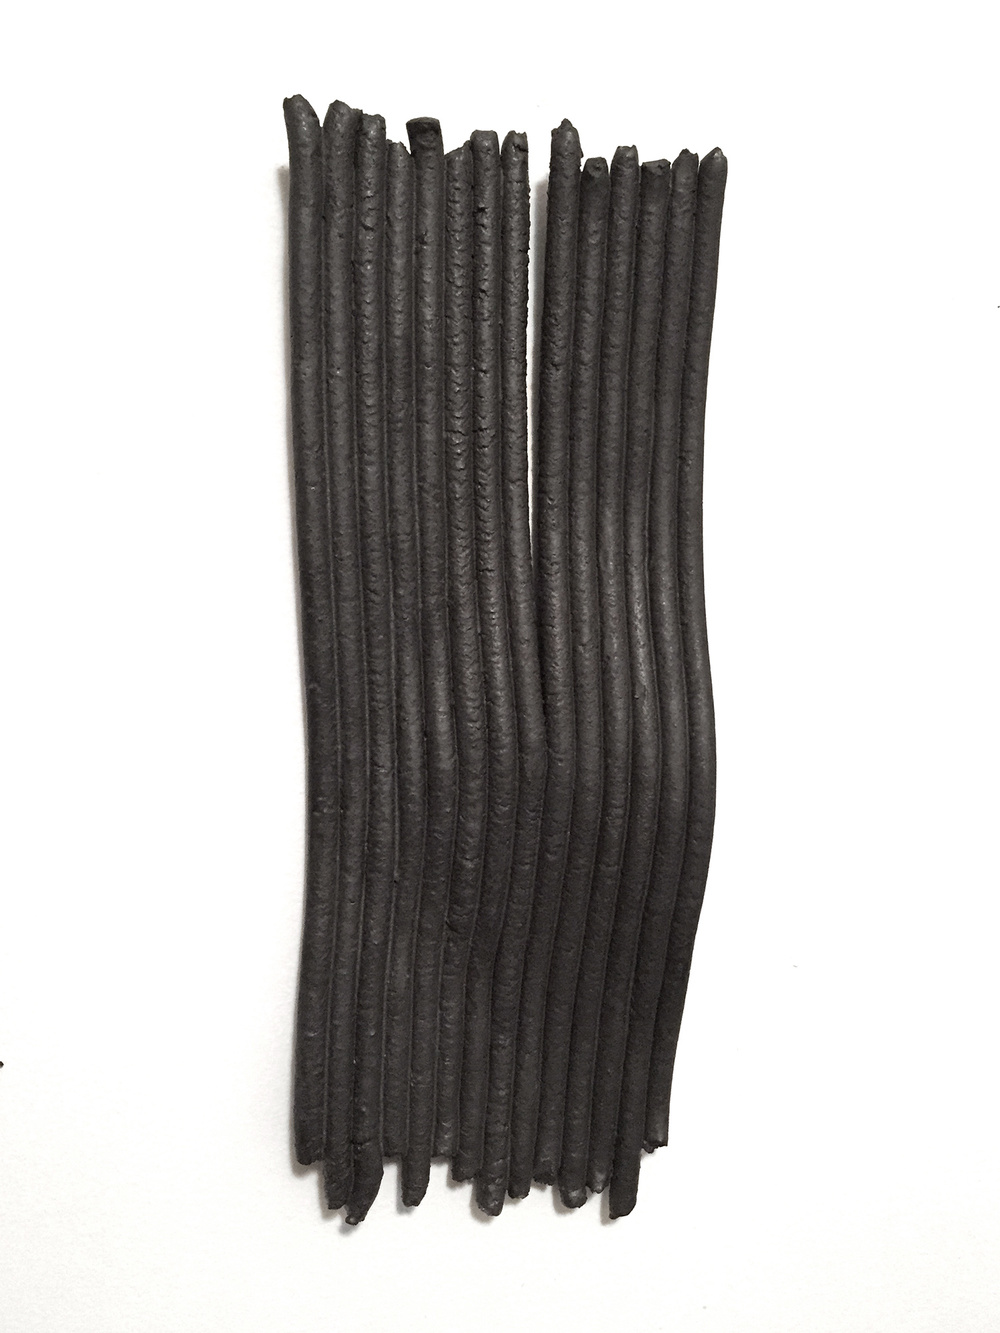 Struggs: For Aaron B  2015 glazed ceramic 6 x 17 x 2 inches